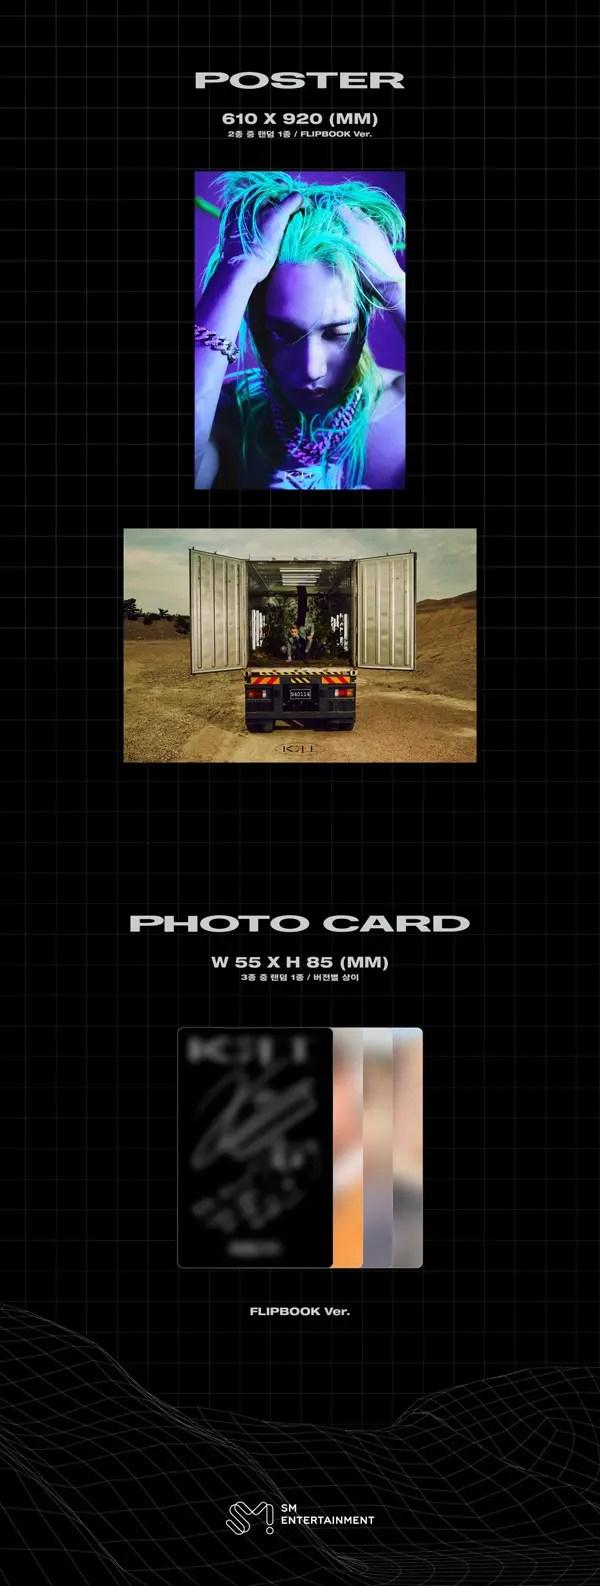 KAI 카이 The 1st Mini Album [KAI (开)] - Flip Book Version - Details #3